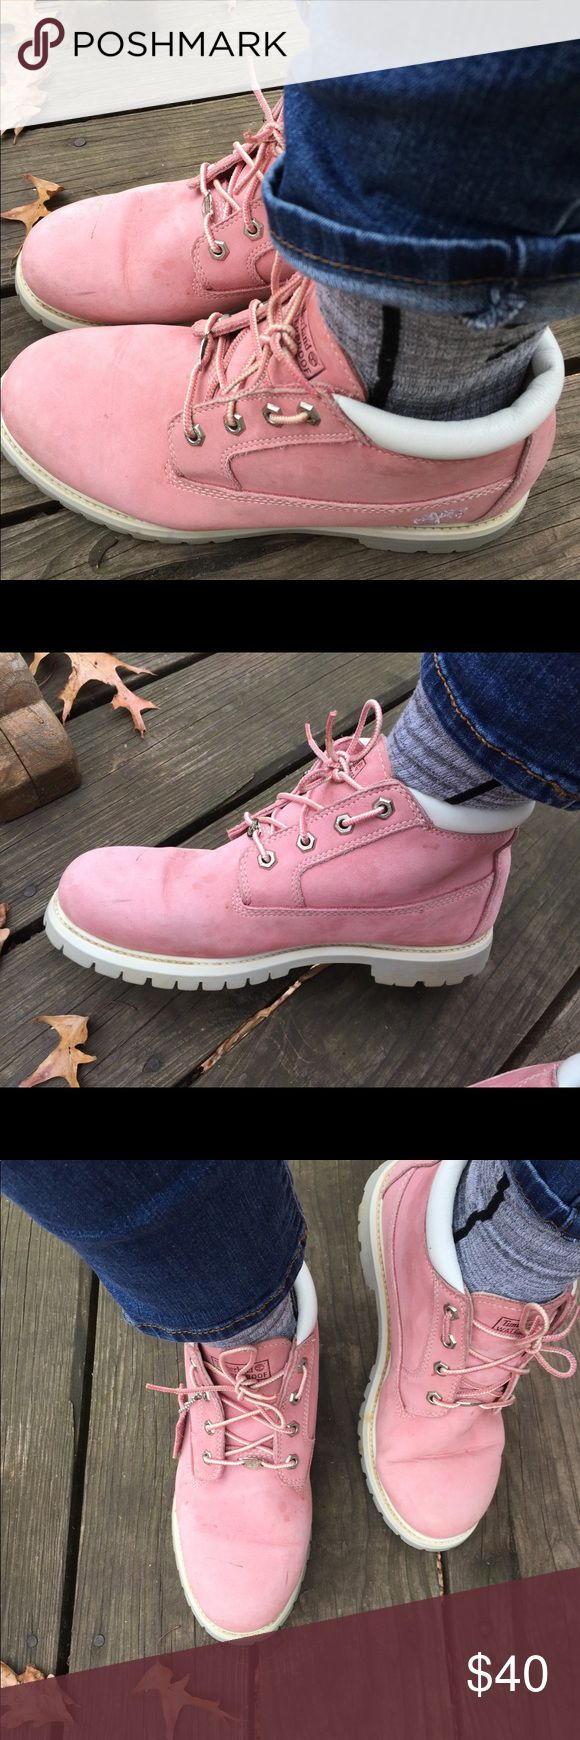 Women's pink Timberland boots size 11 waterproof So cute size 11 waterproof classic Timberland Shoes